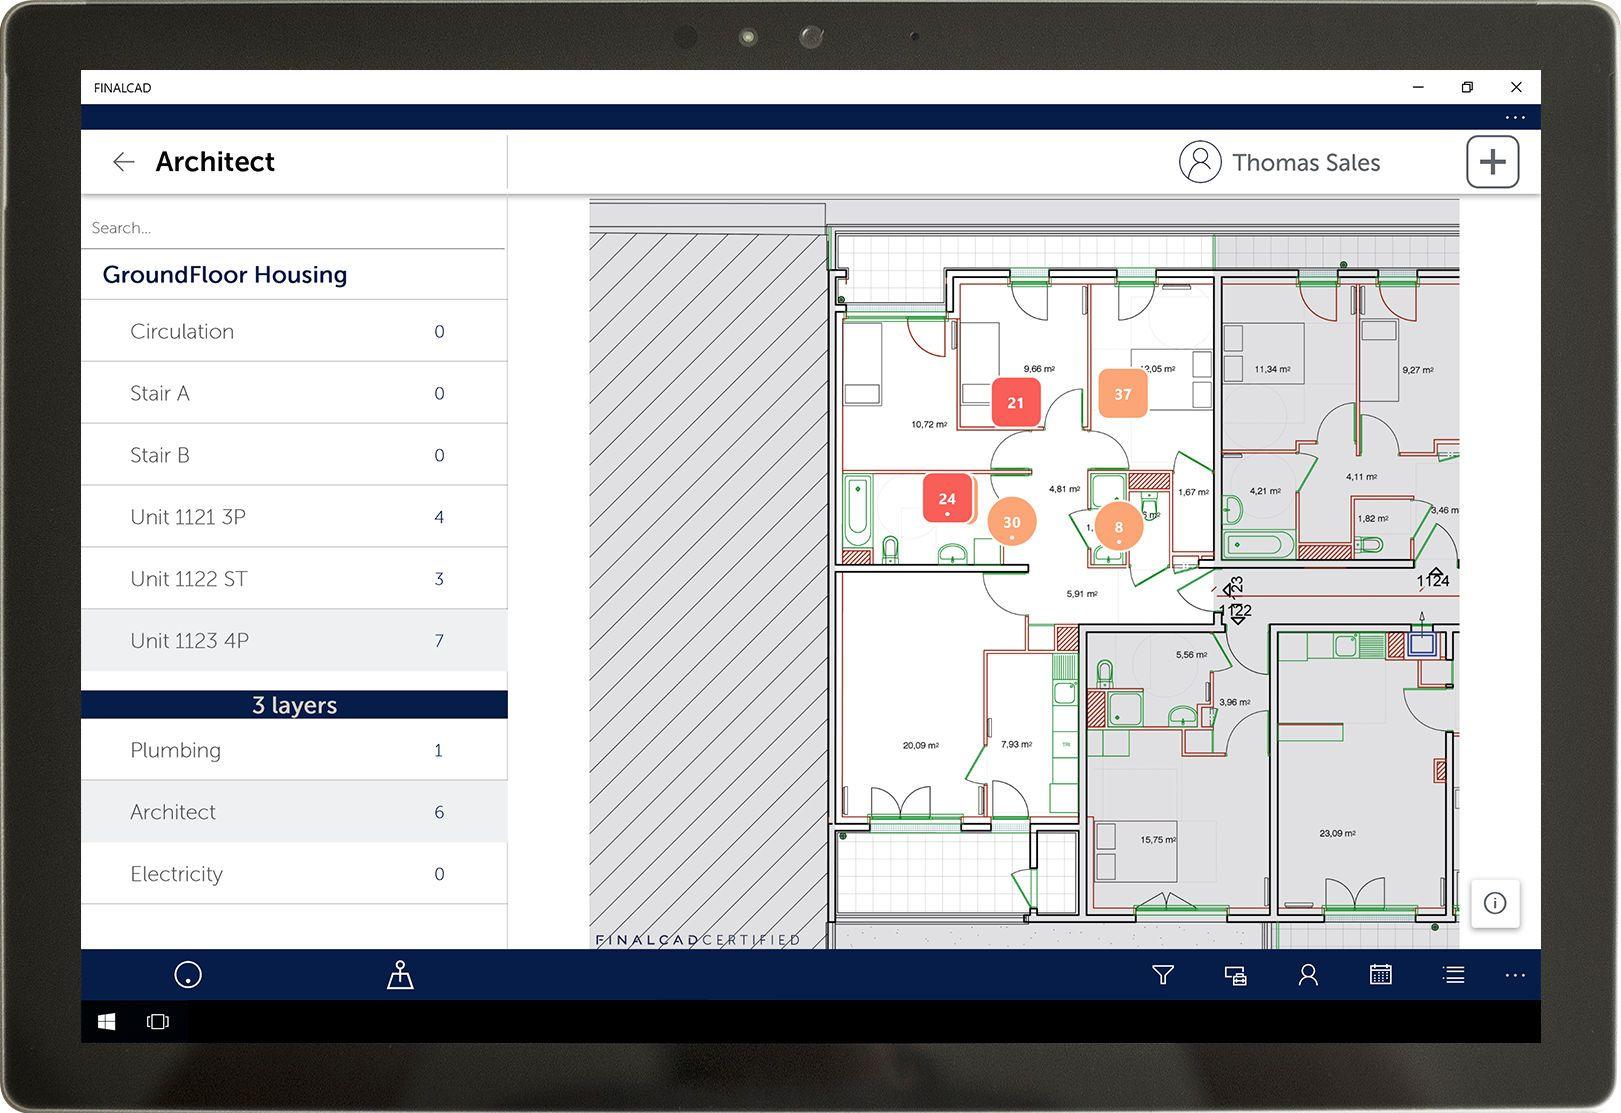 FINALCAD-Windows10-Architect_blueprint